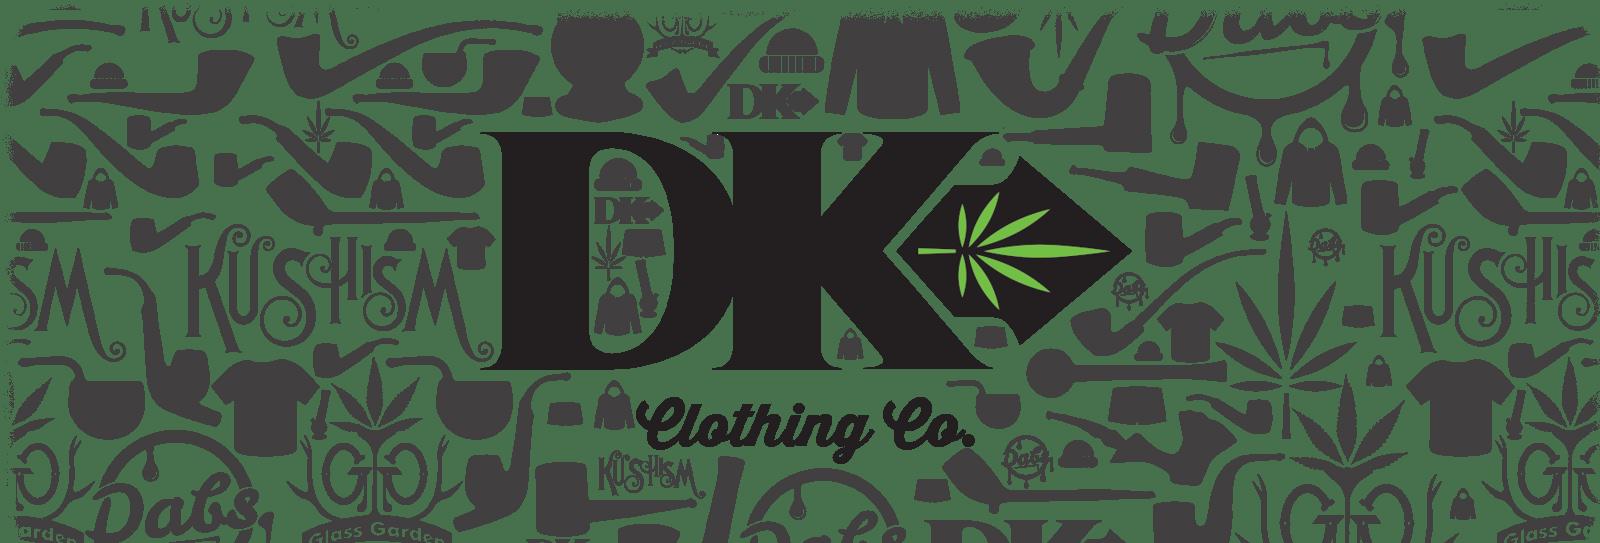 DK Clothing Co.